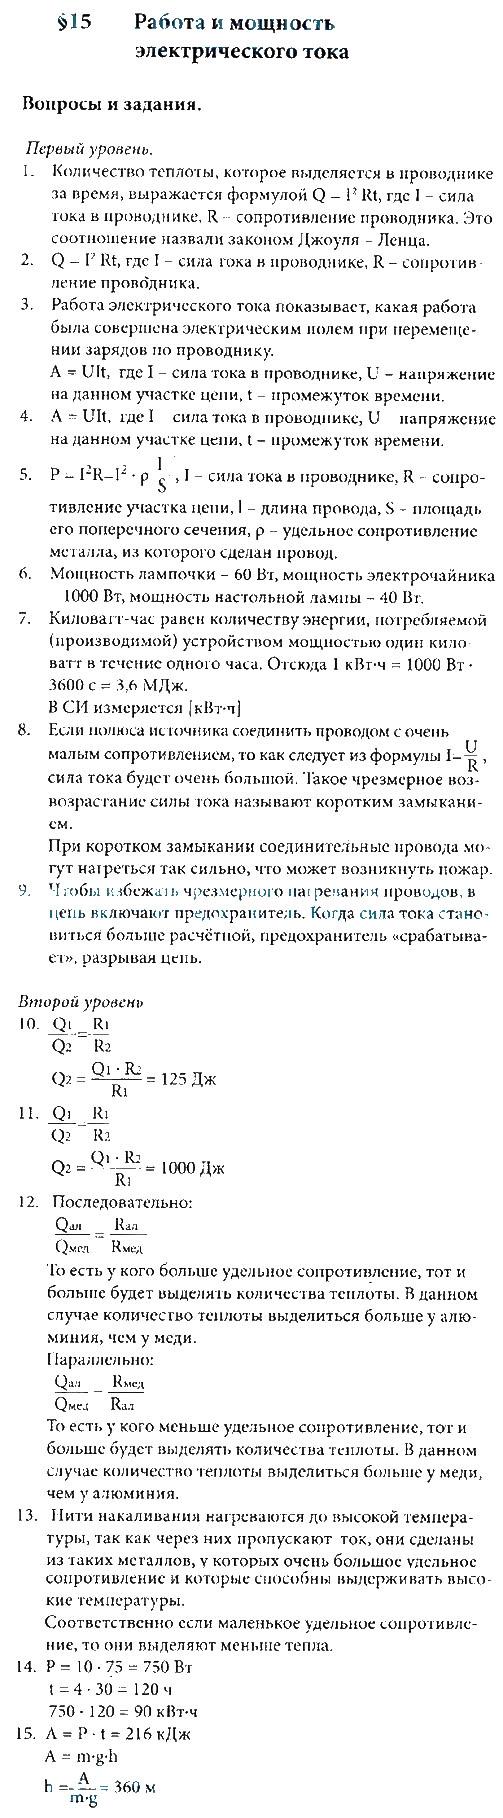 Гдз 7 класс физика л.э.генденштейн решение задач по задачнику